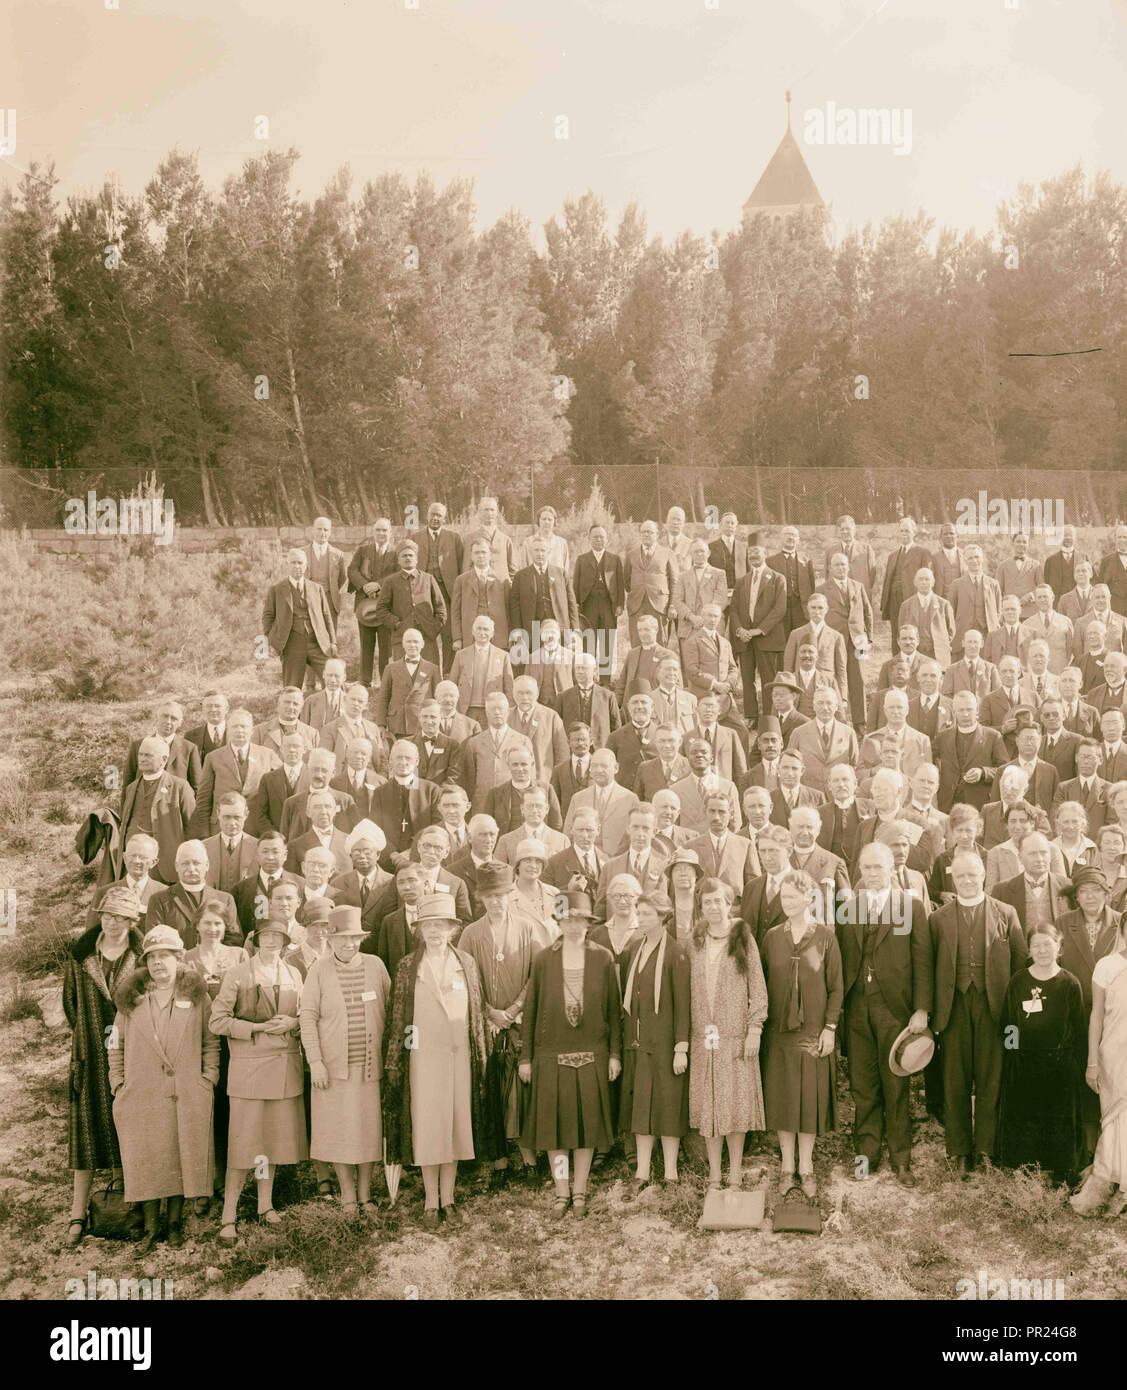 Entire I.M.C., International Missionary Council group, 1928. 1928, Jerusalem, Israel - Stock Image